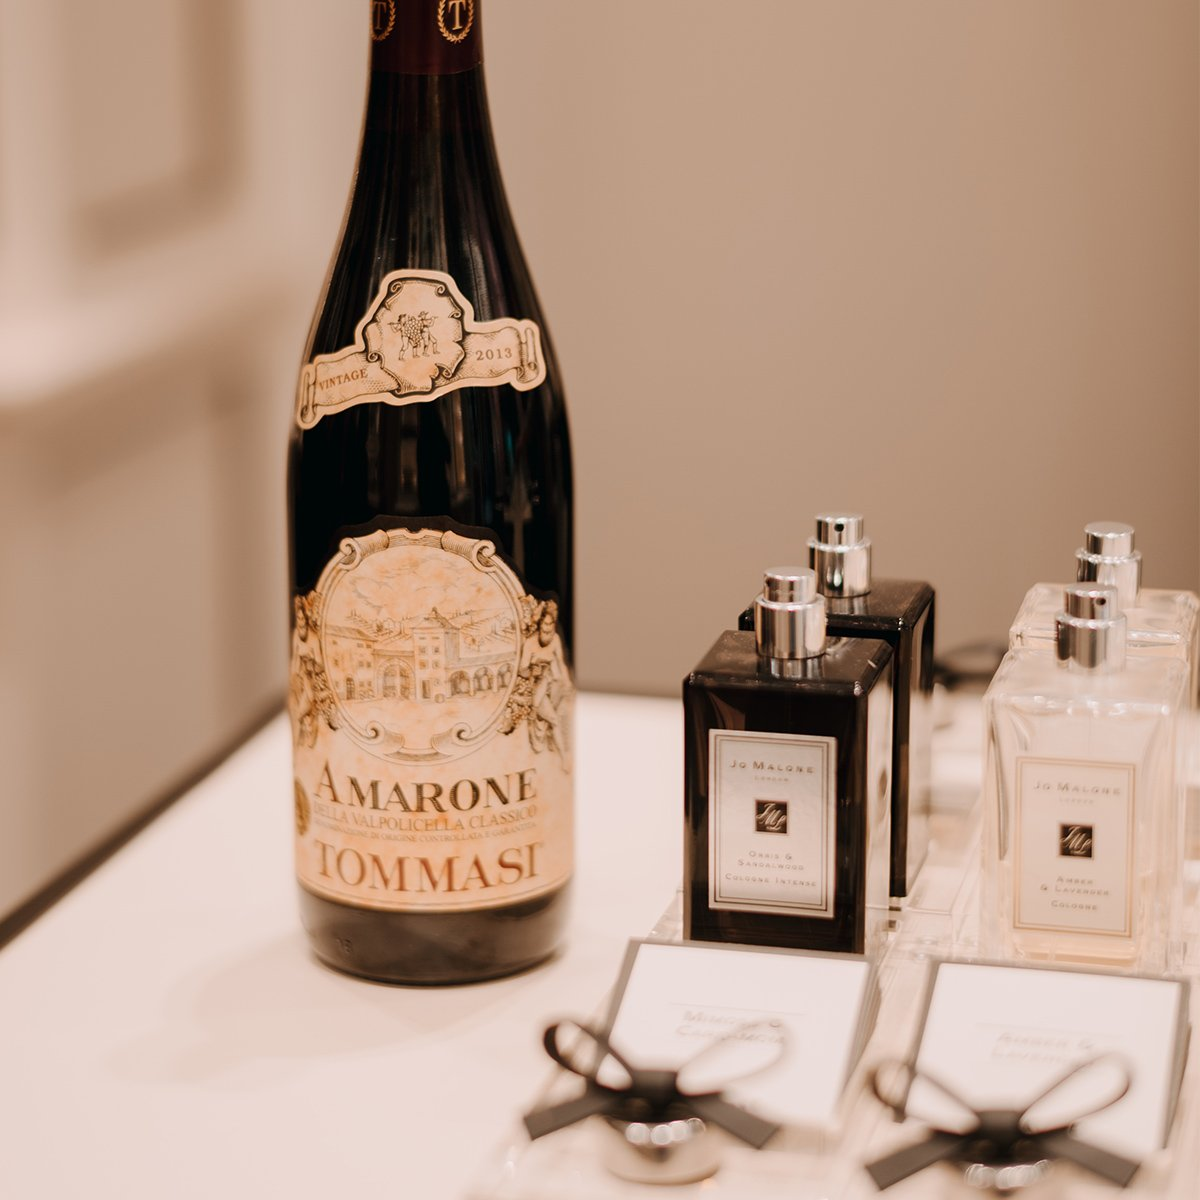 jomalone-tommasi-wine-tasting